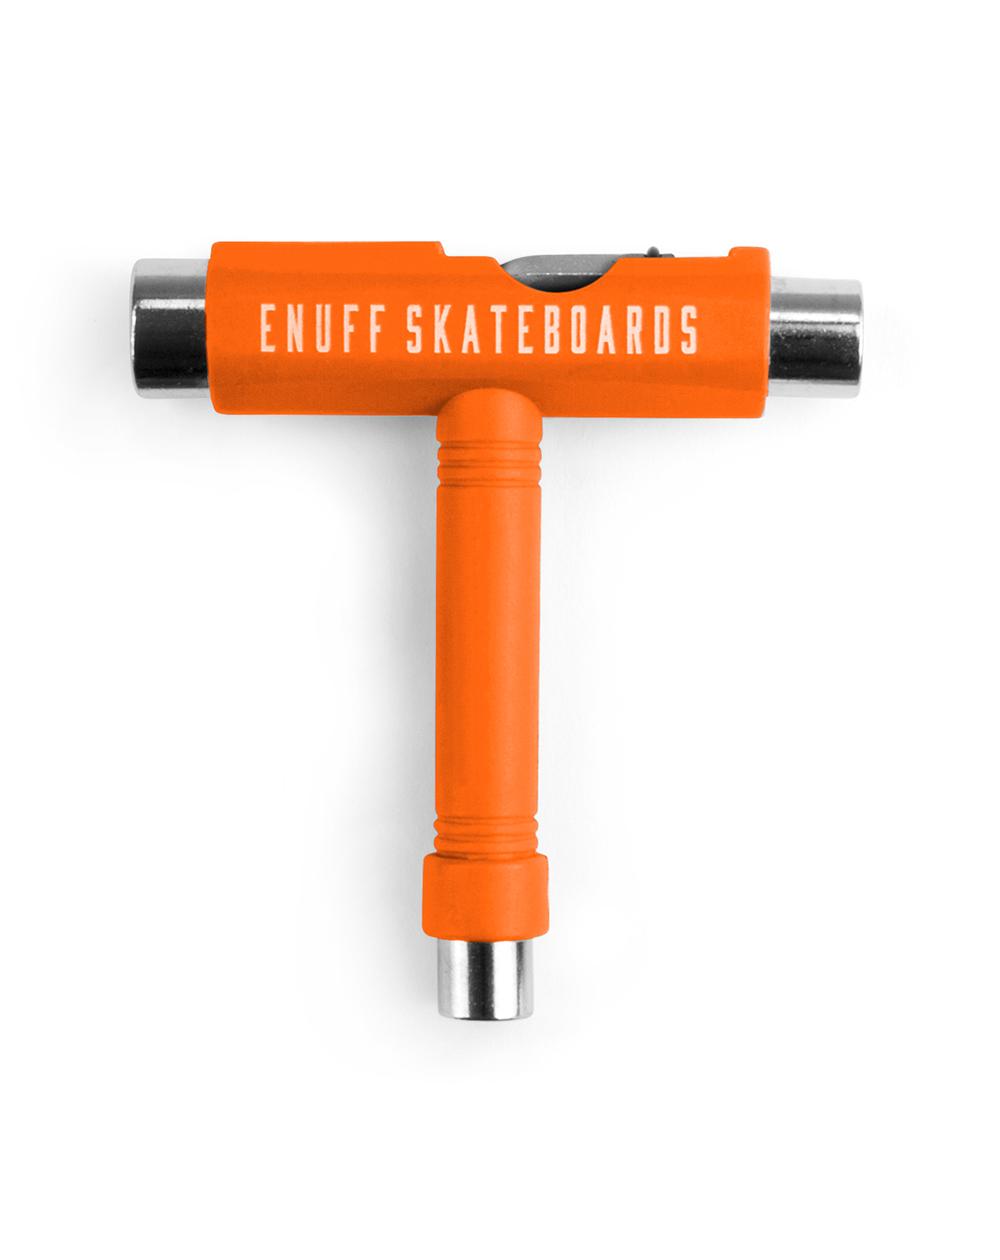 Enuff Clef de Montage Skateboard Essential Tool Orange